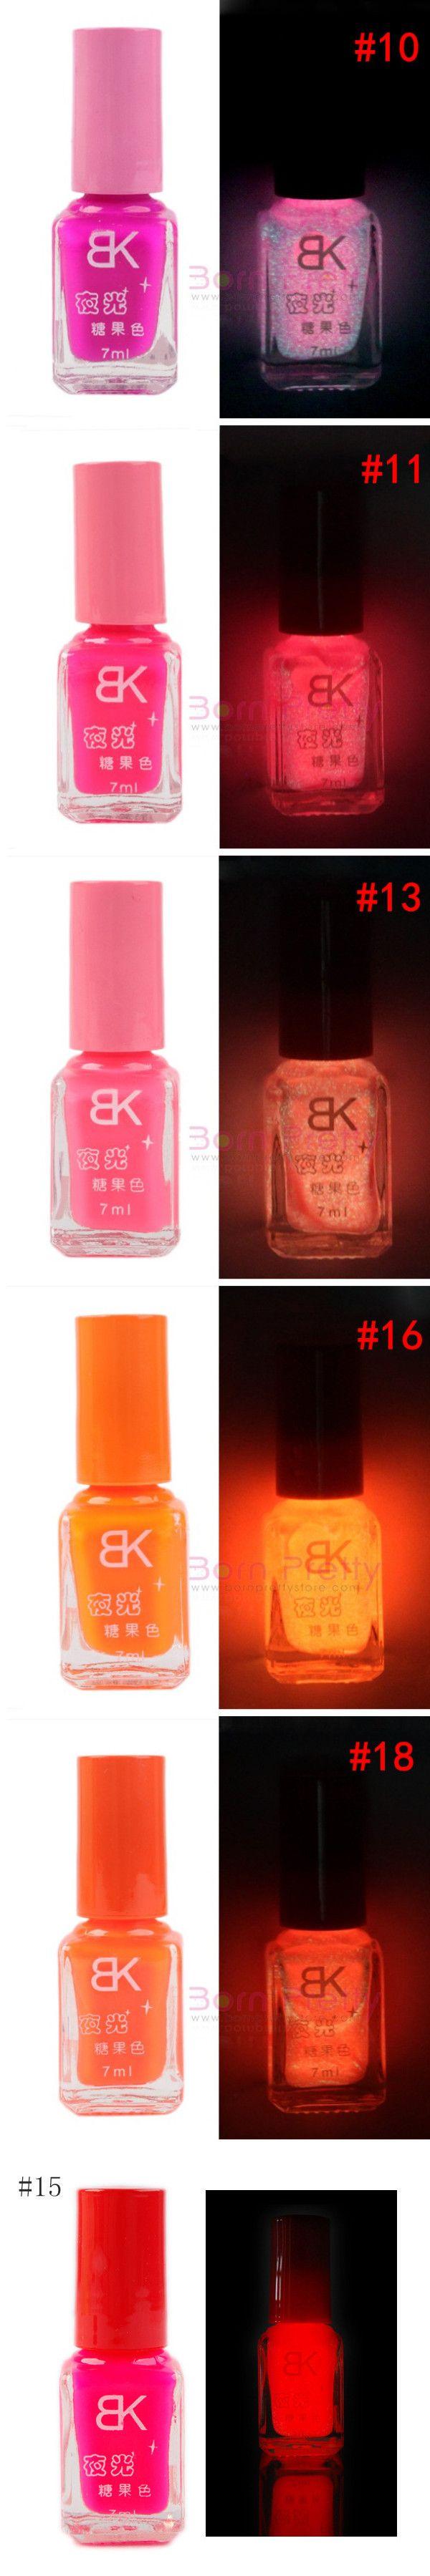 $2.99 Candy Colors Fluorescent Neon Luminous Nail Art Polish Glow In Dark Varnish 7ML - BornPrettyStore.com